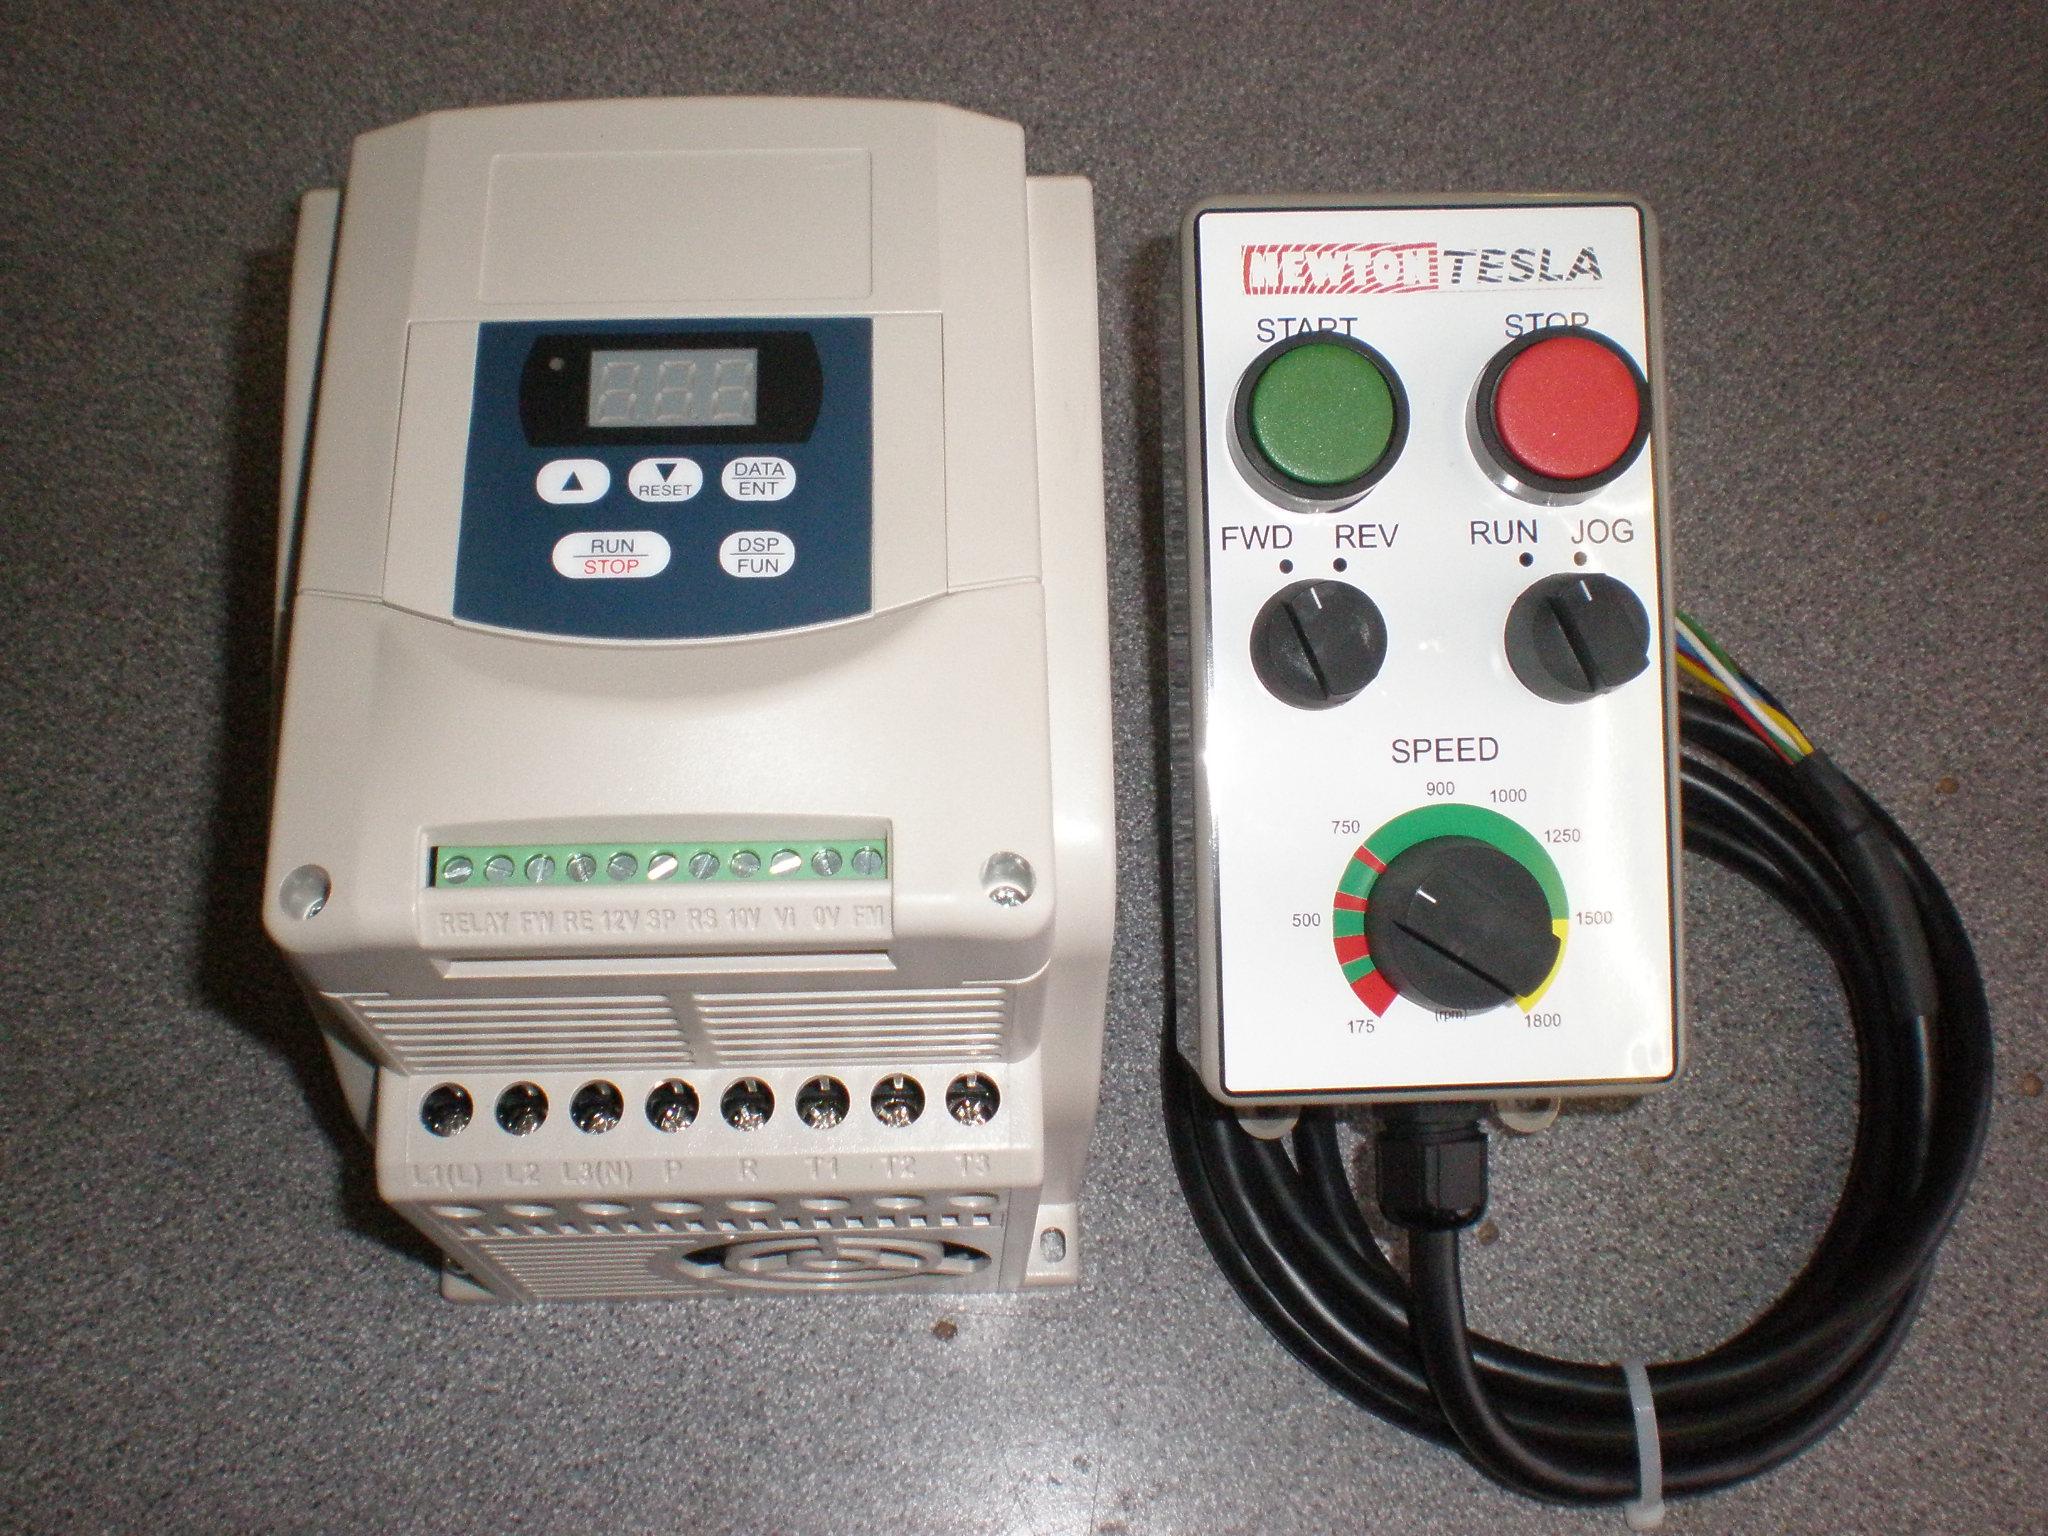 Newton tesla lathe speed control warrington inverter remote pendant teco cheapraybanclubmaster Gallery